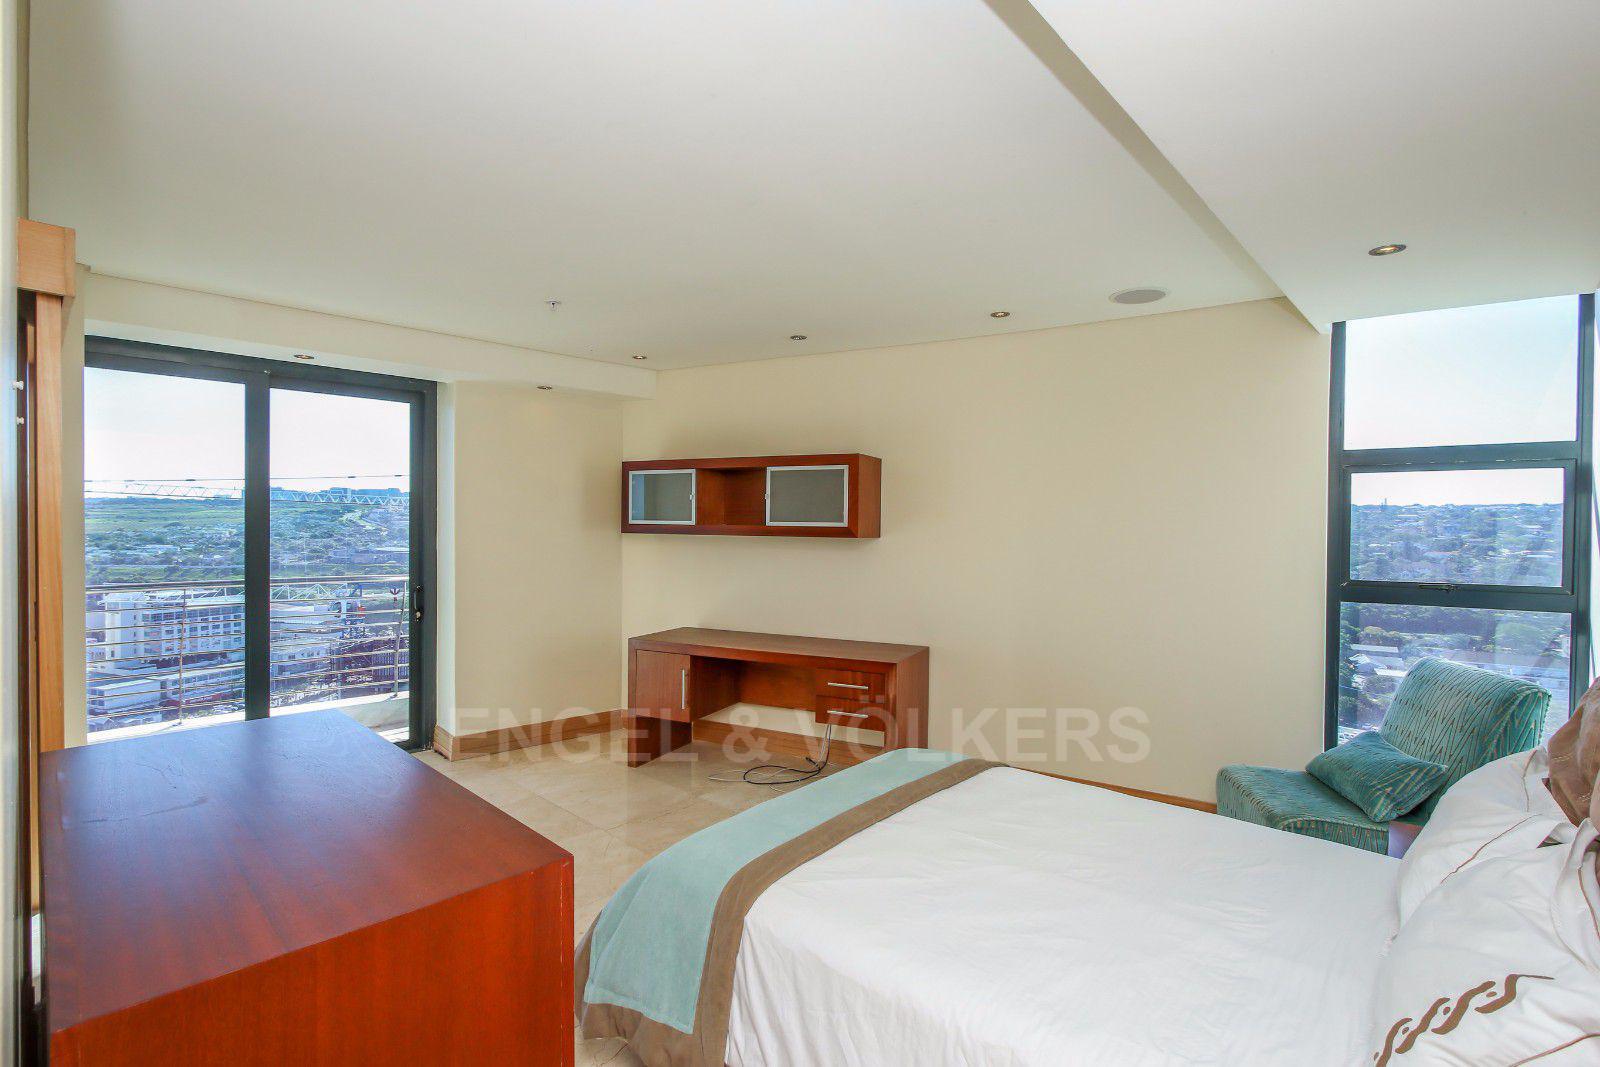 Umhlanga Rocks property for sale. Ref No: 13397187. Picture no 53